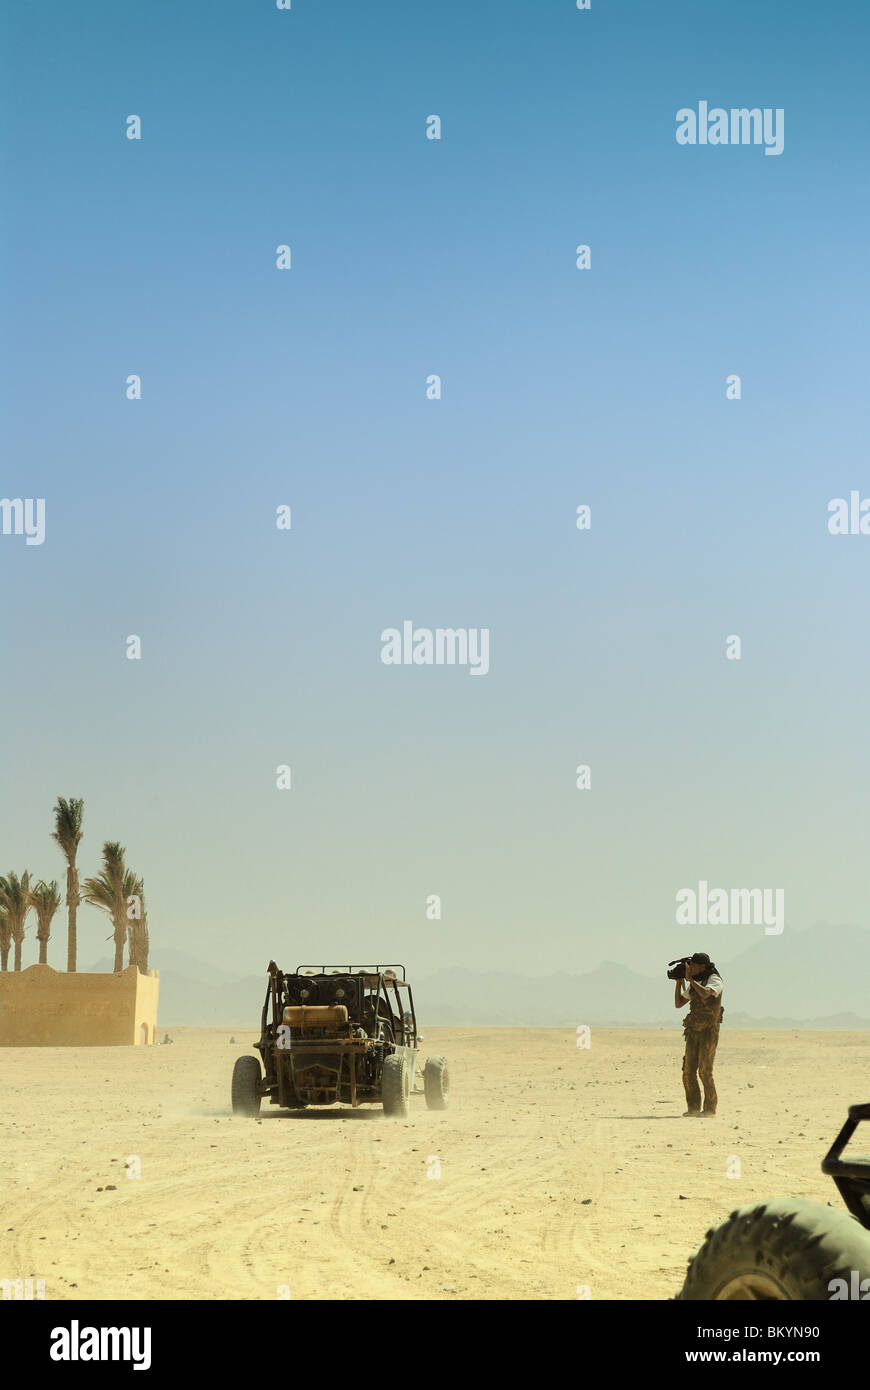 Operator filming desert safari, North Africa, Egypt - Stock Image